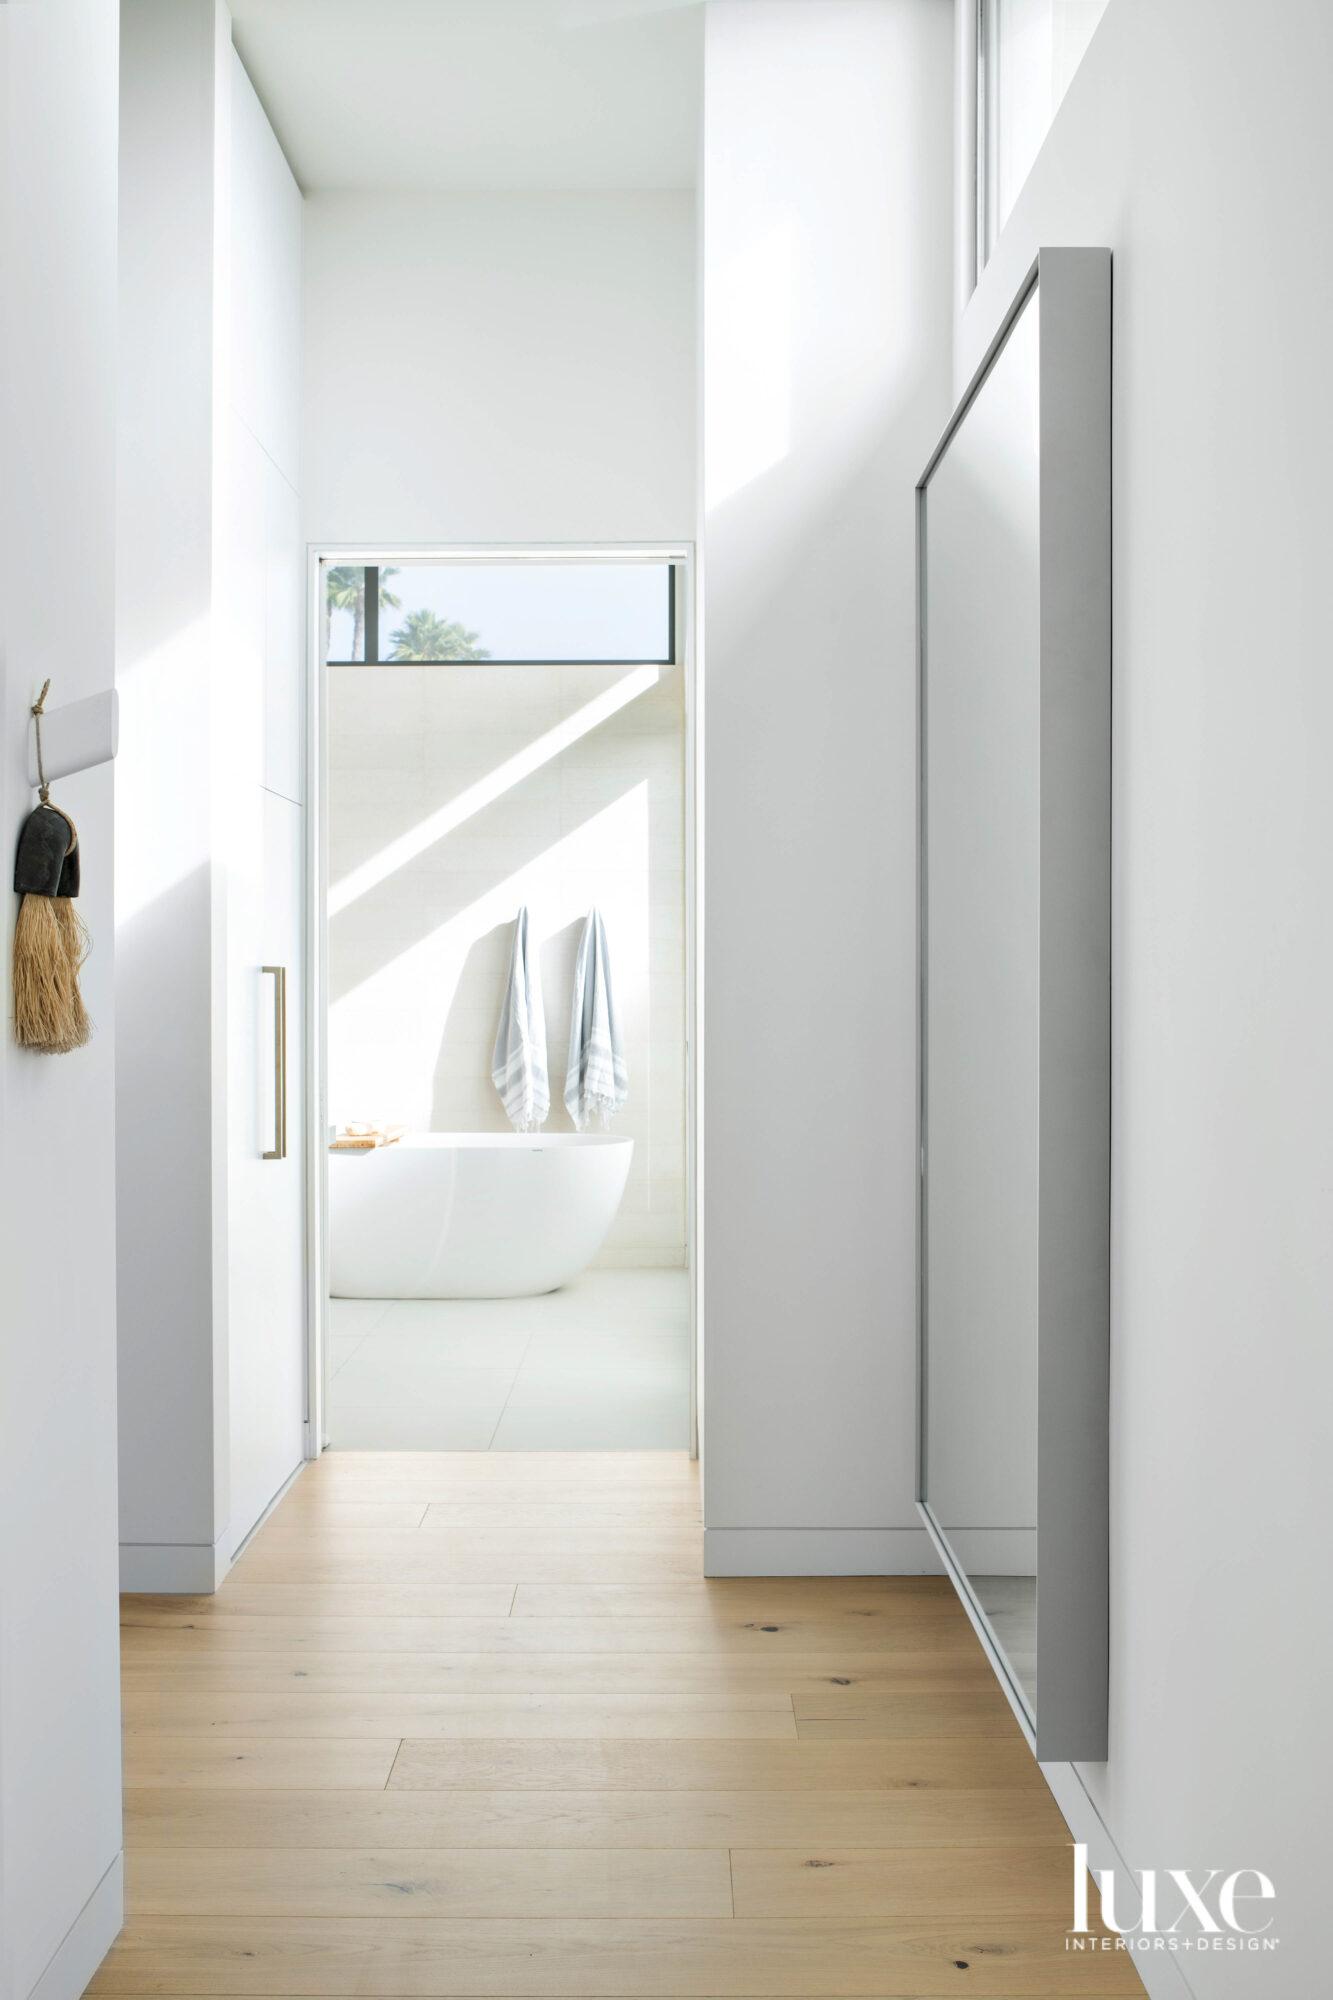 Hallway to main bathroom with...